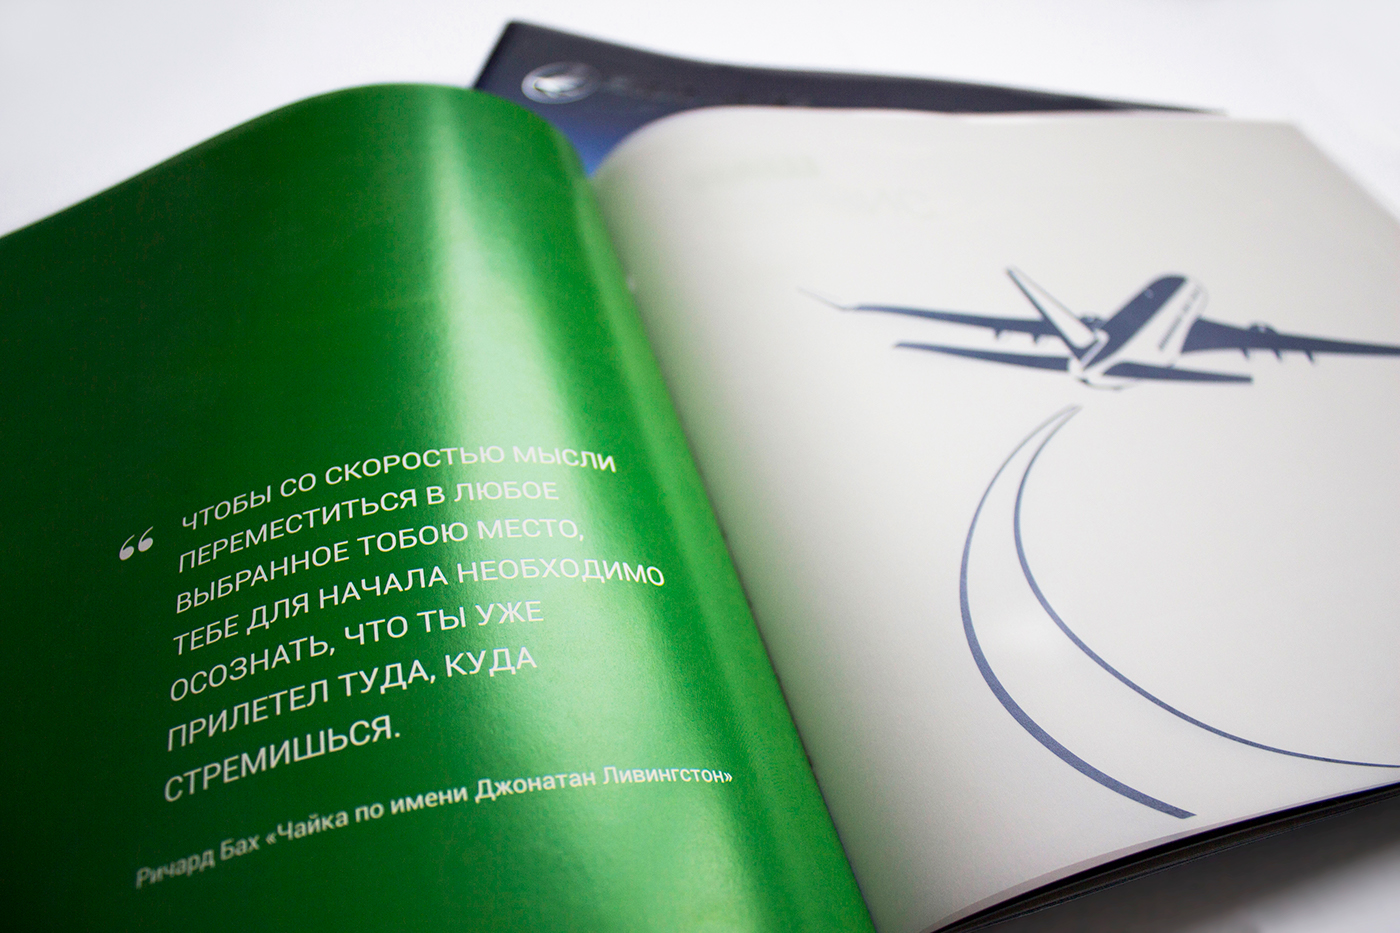 book SKY magazine print air Aircraft plane anniversary text